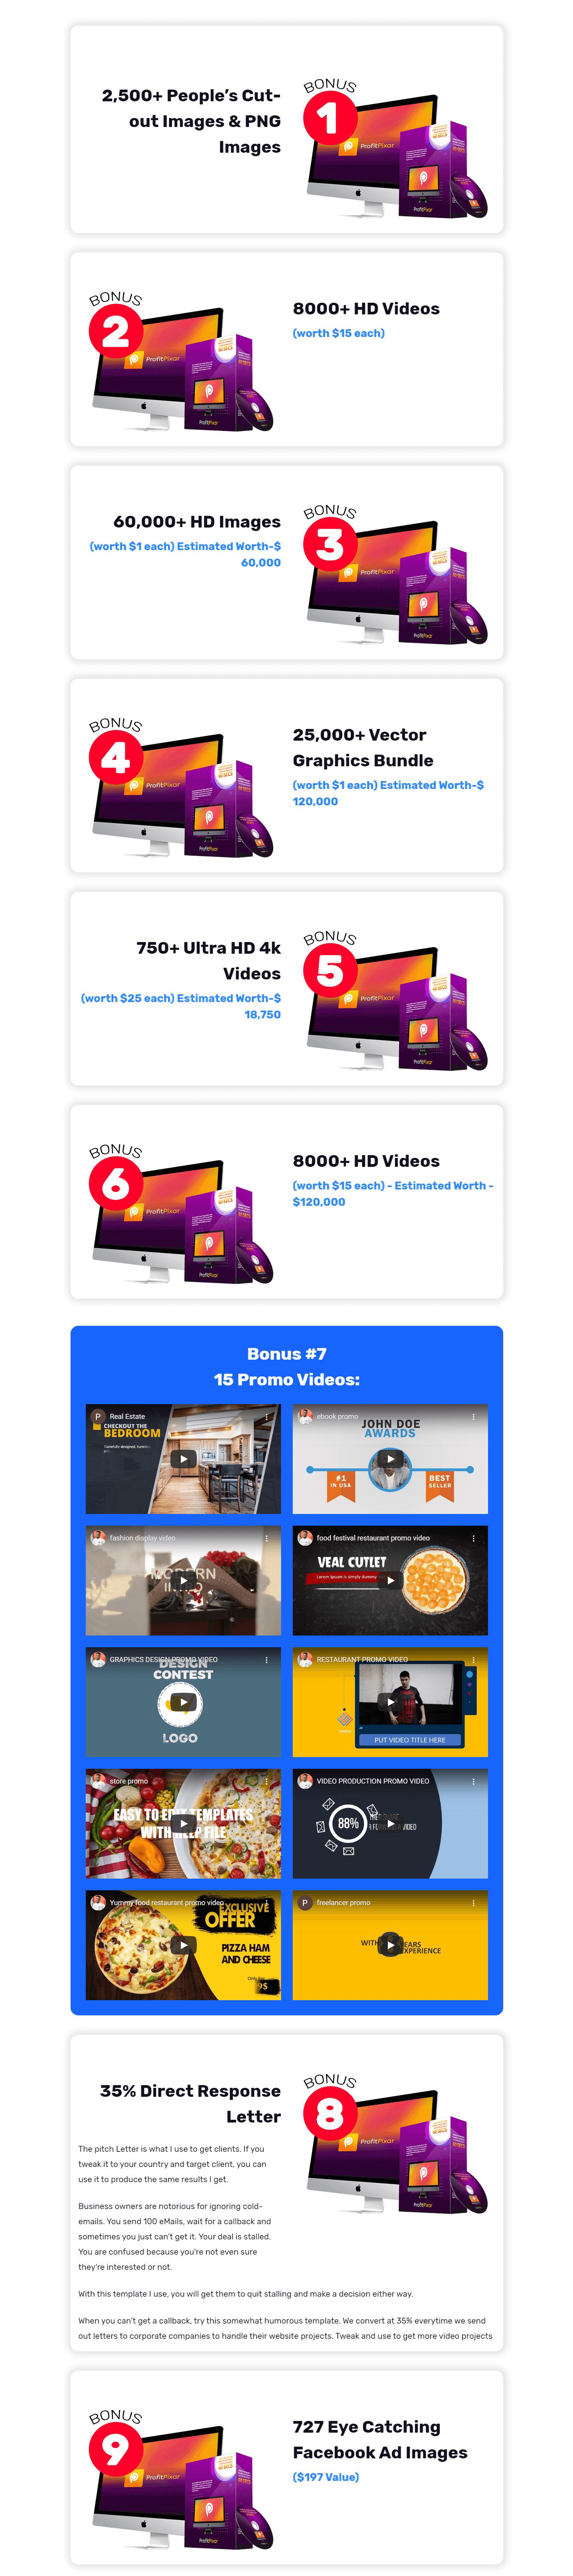 ProfitPixar-Bonuses